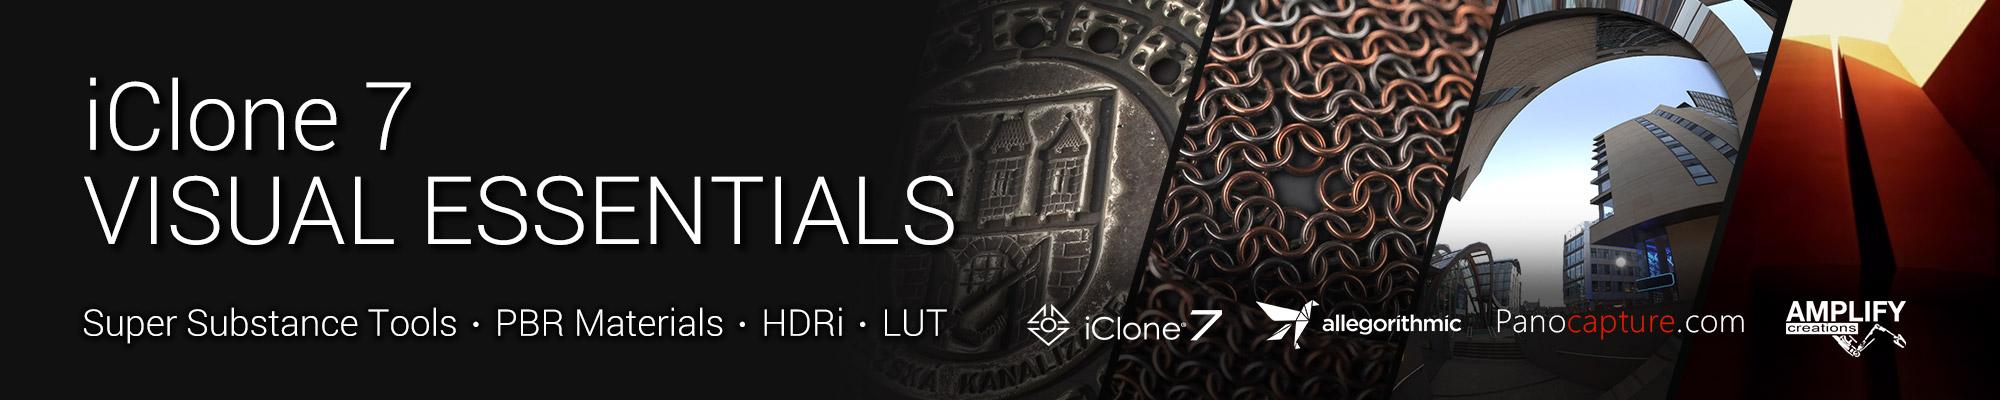 iClone 7 Visual Essensials